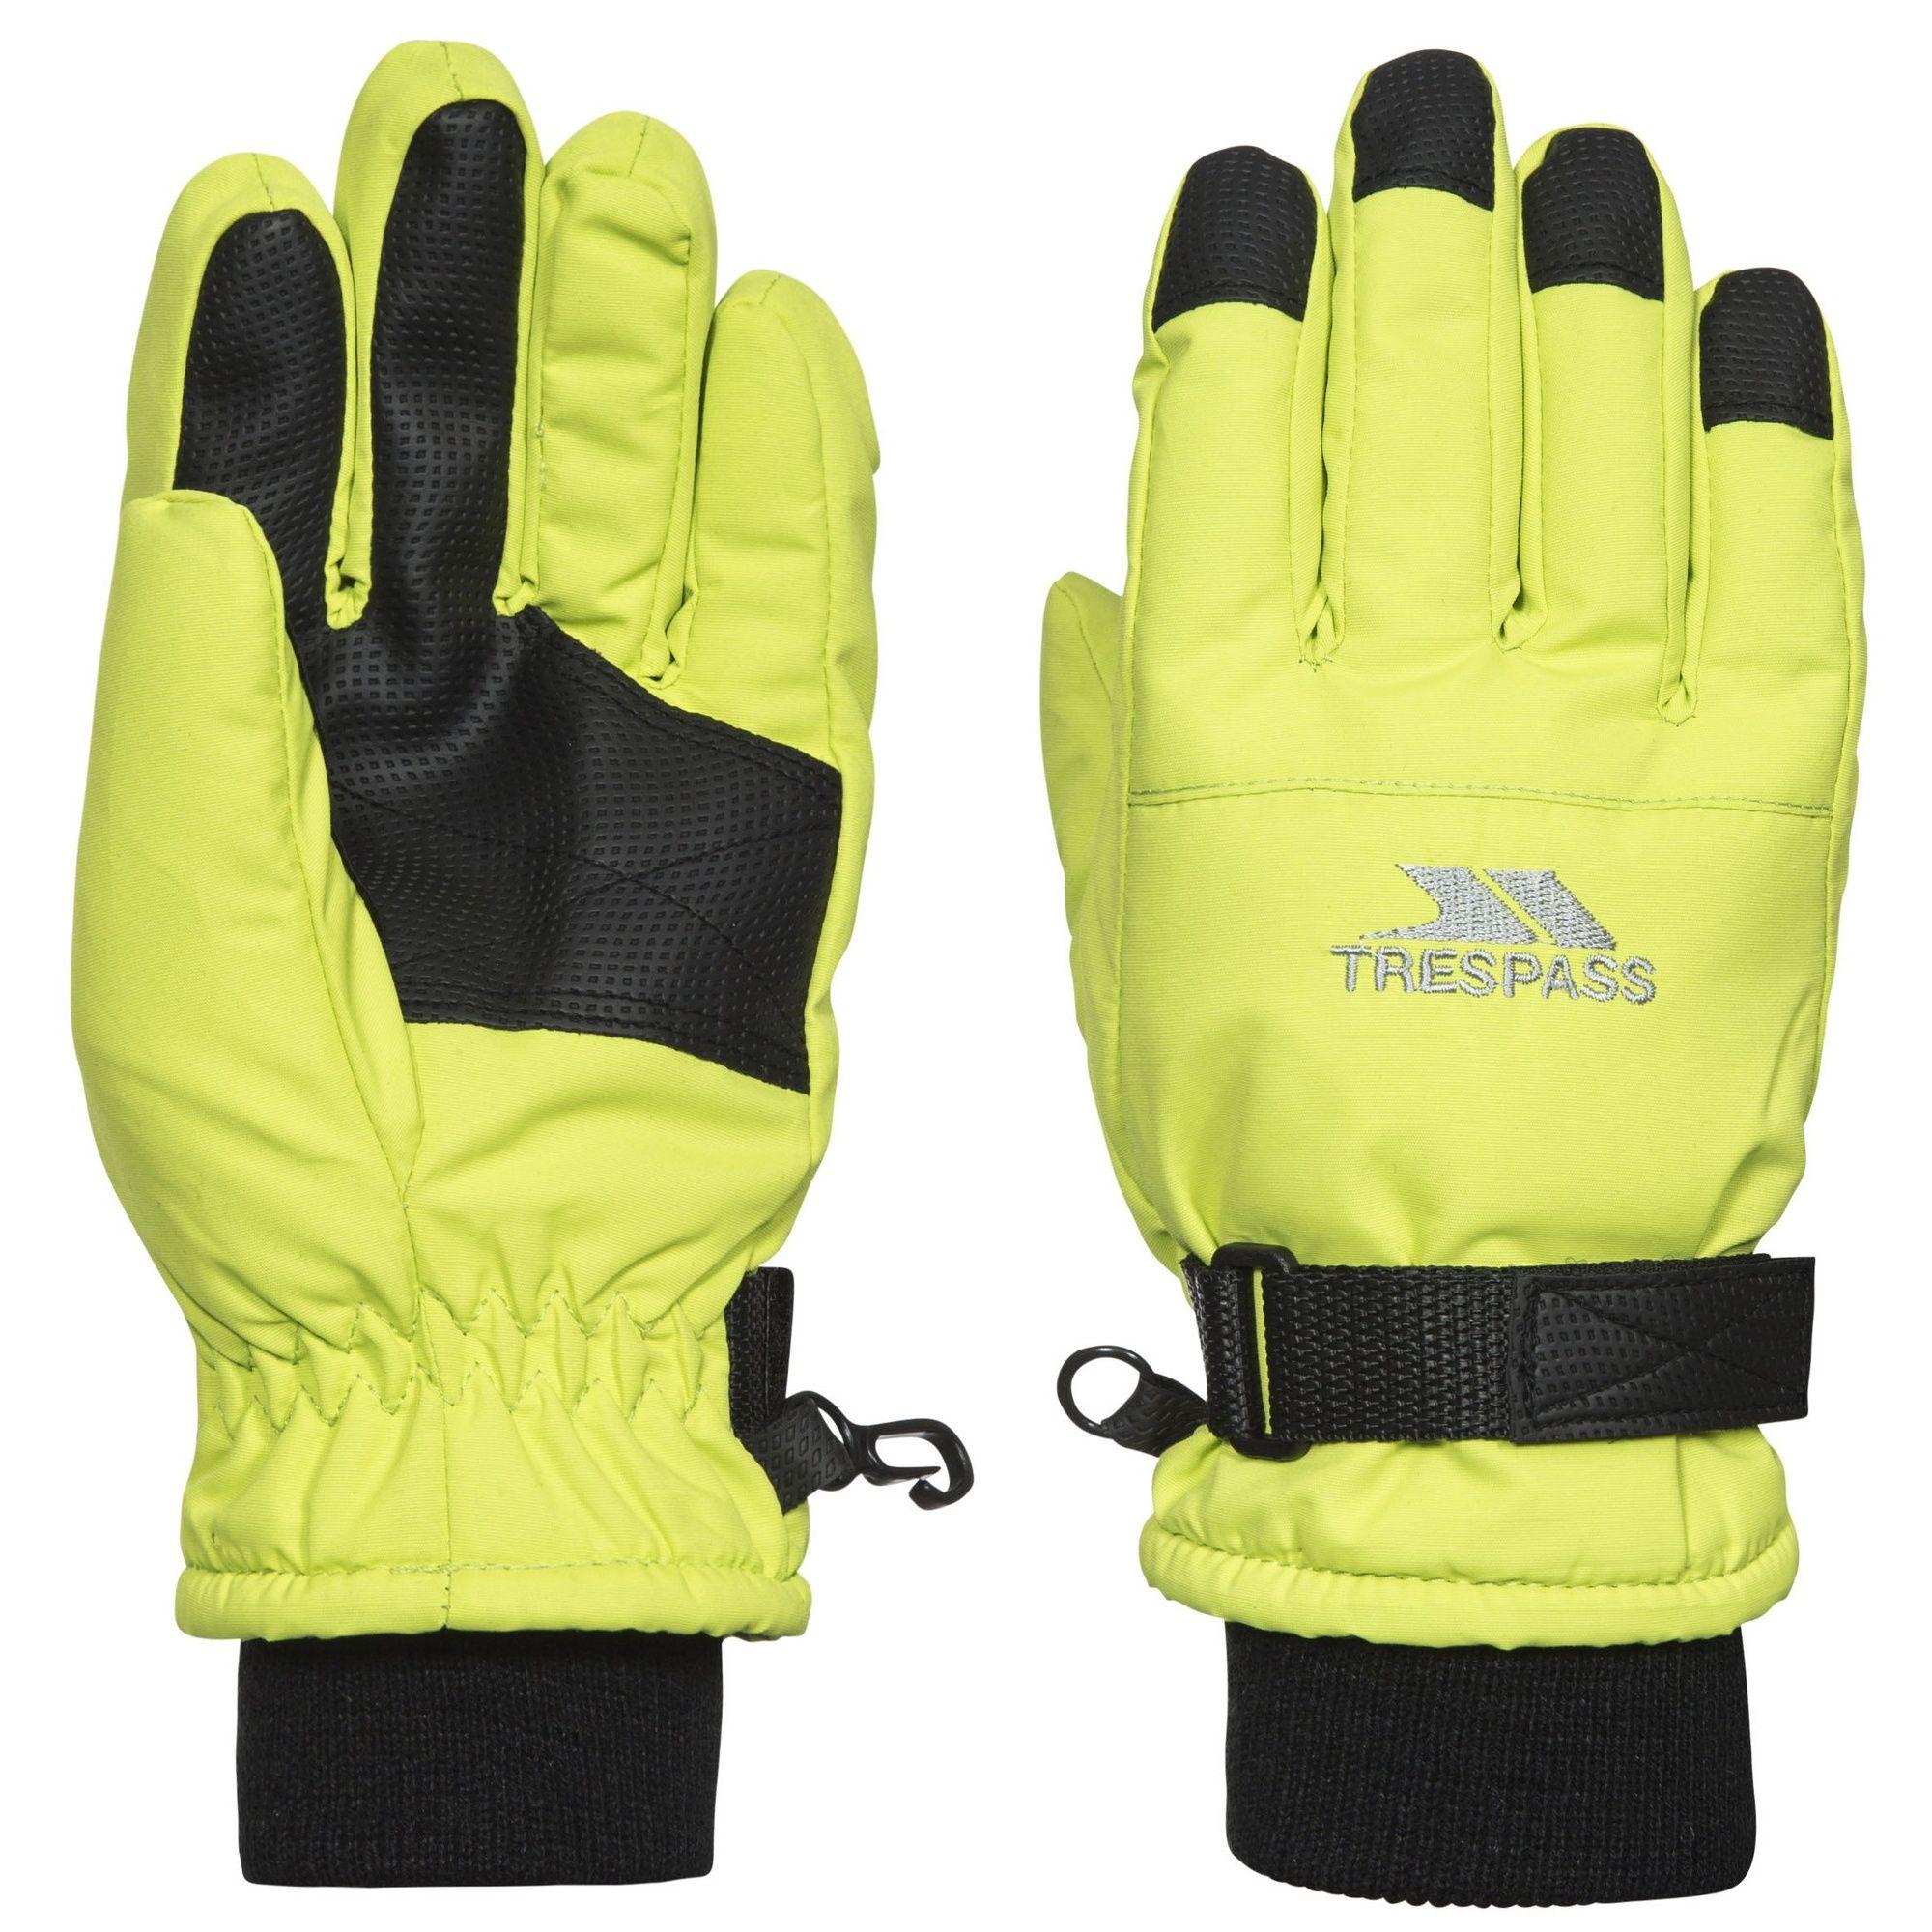 Trespass Childrens/Kids Ruri II Winter Ski Gloves